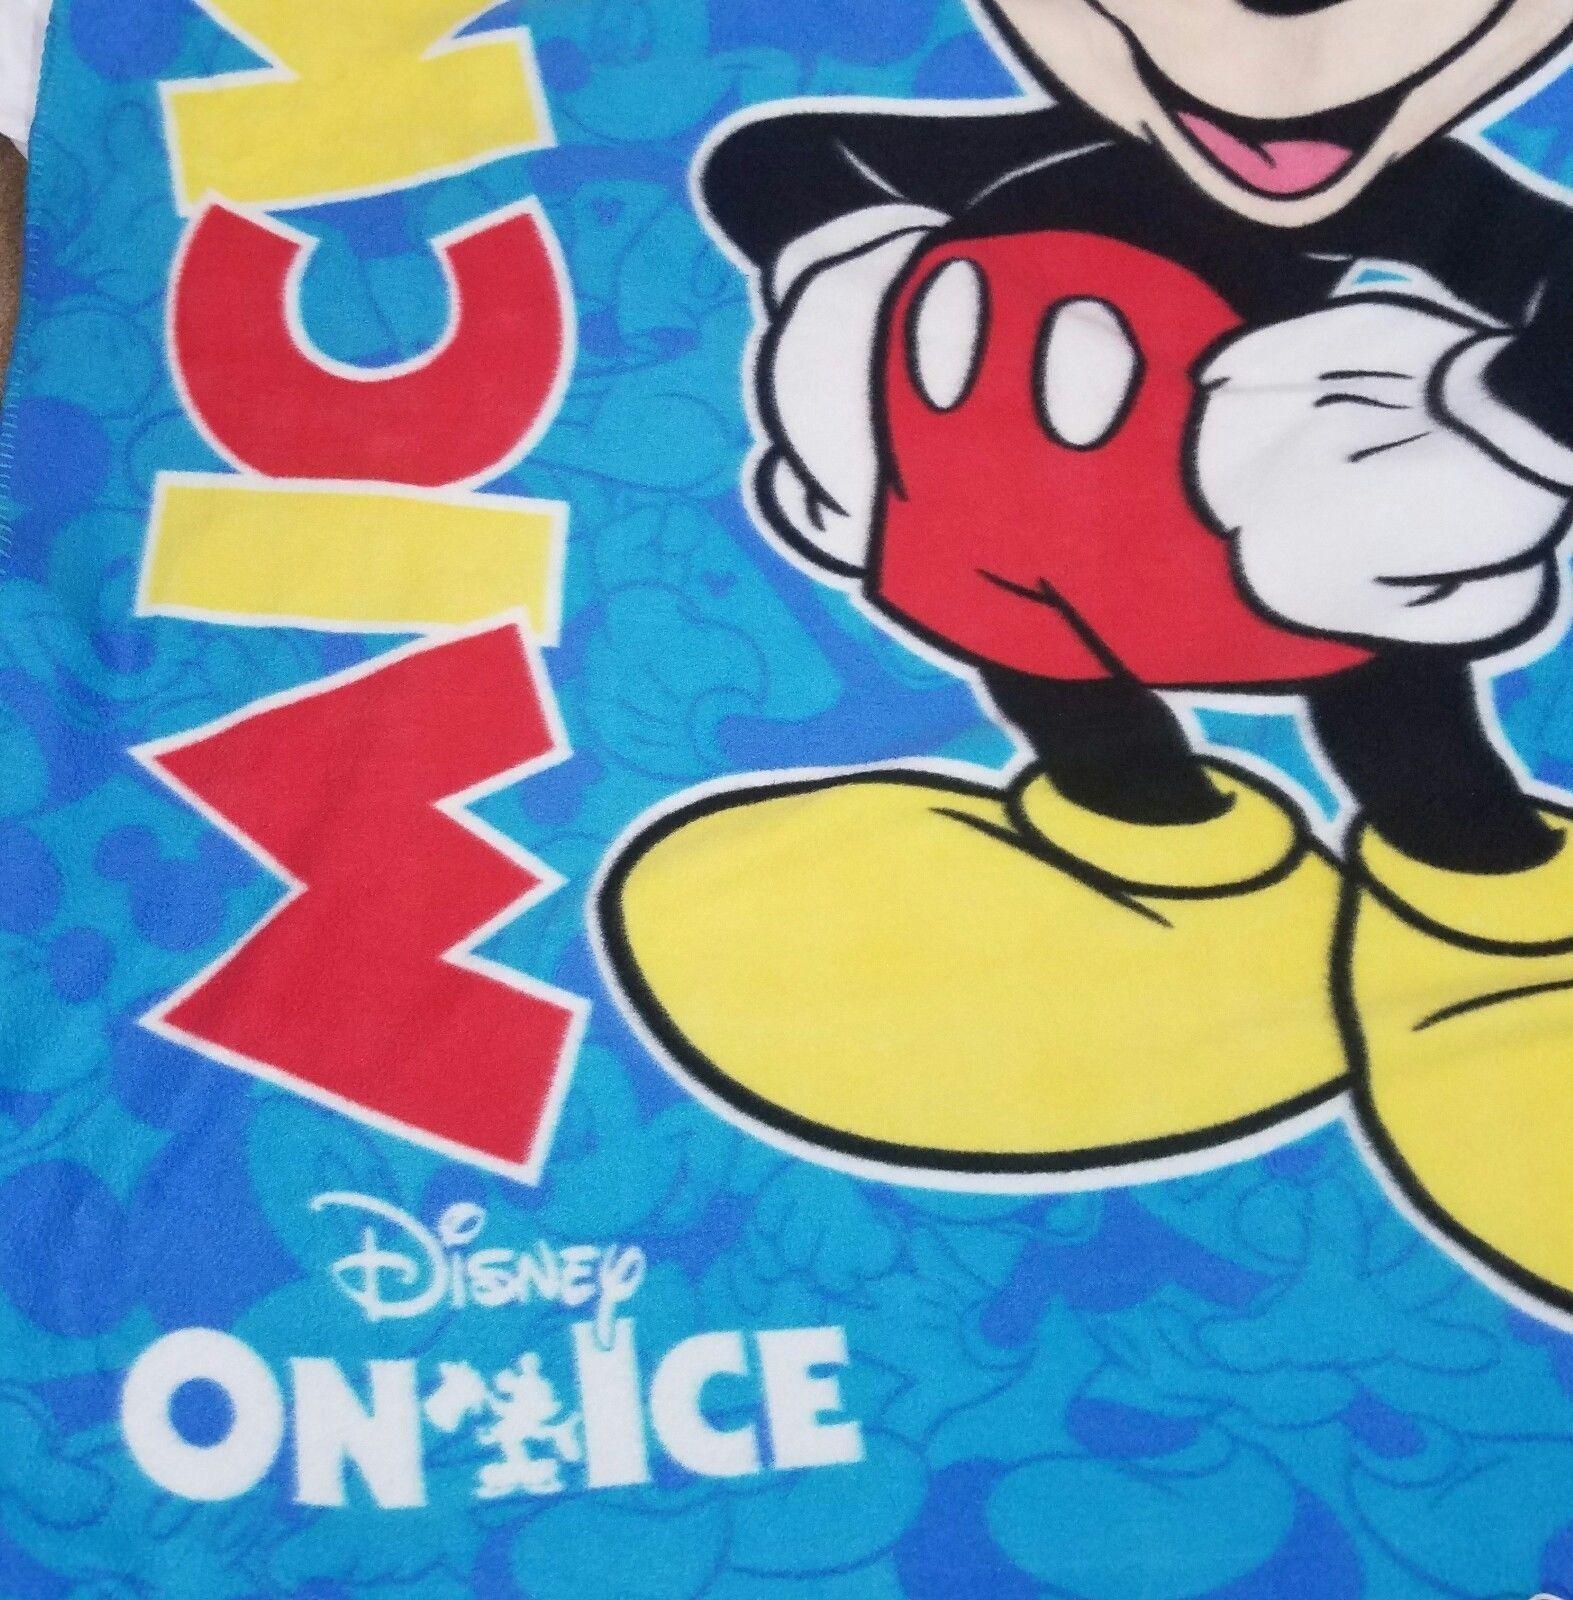 Disney On Ice Fleece Mickey Mouse Blanket Blue 48x58